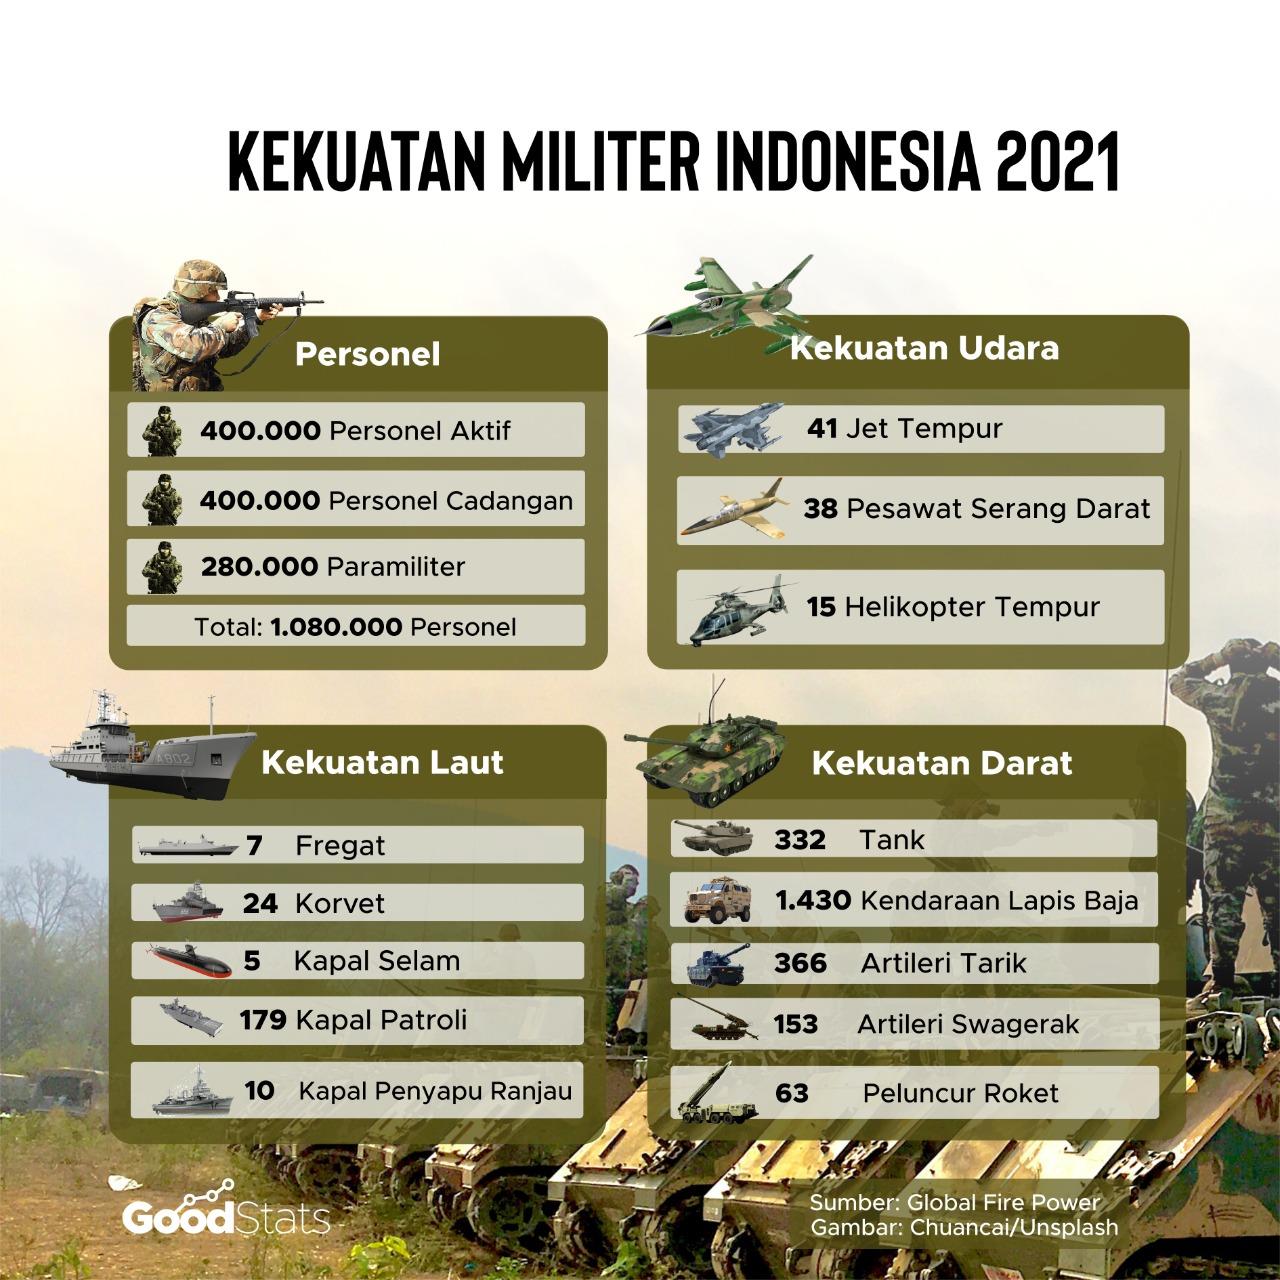 Kekuatan militer Indonesia 2021   Goodstats